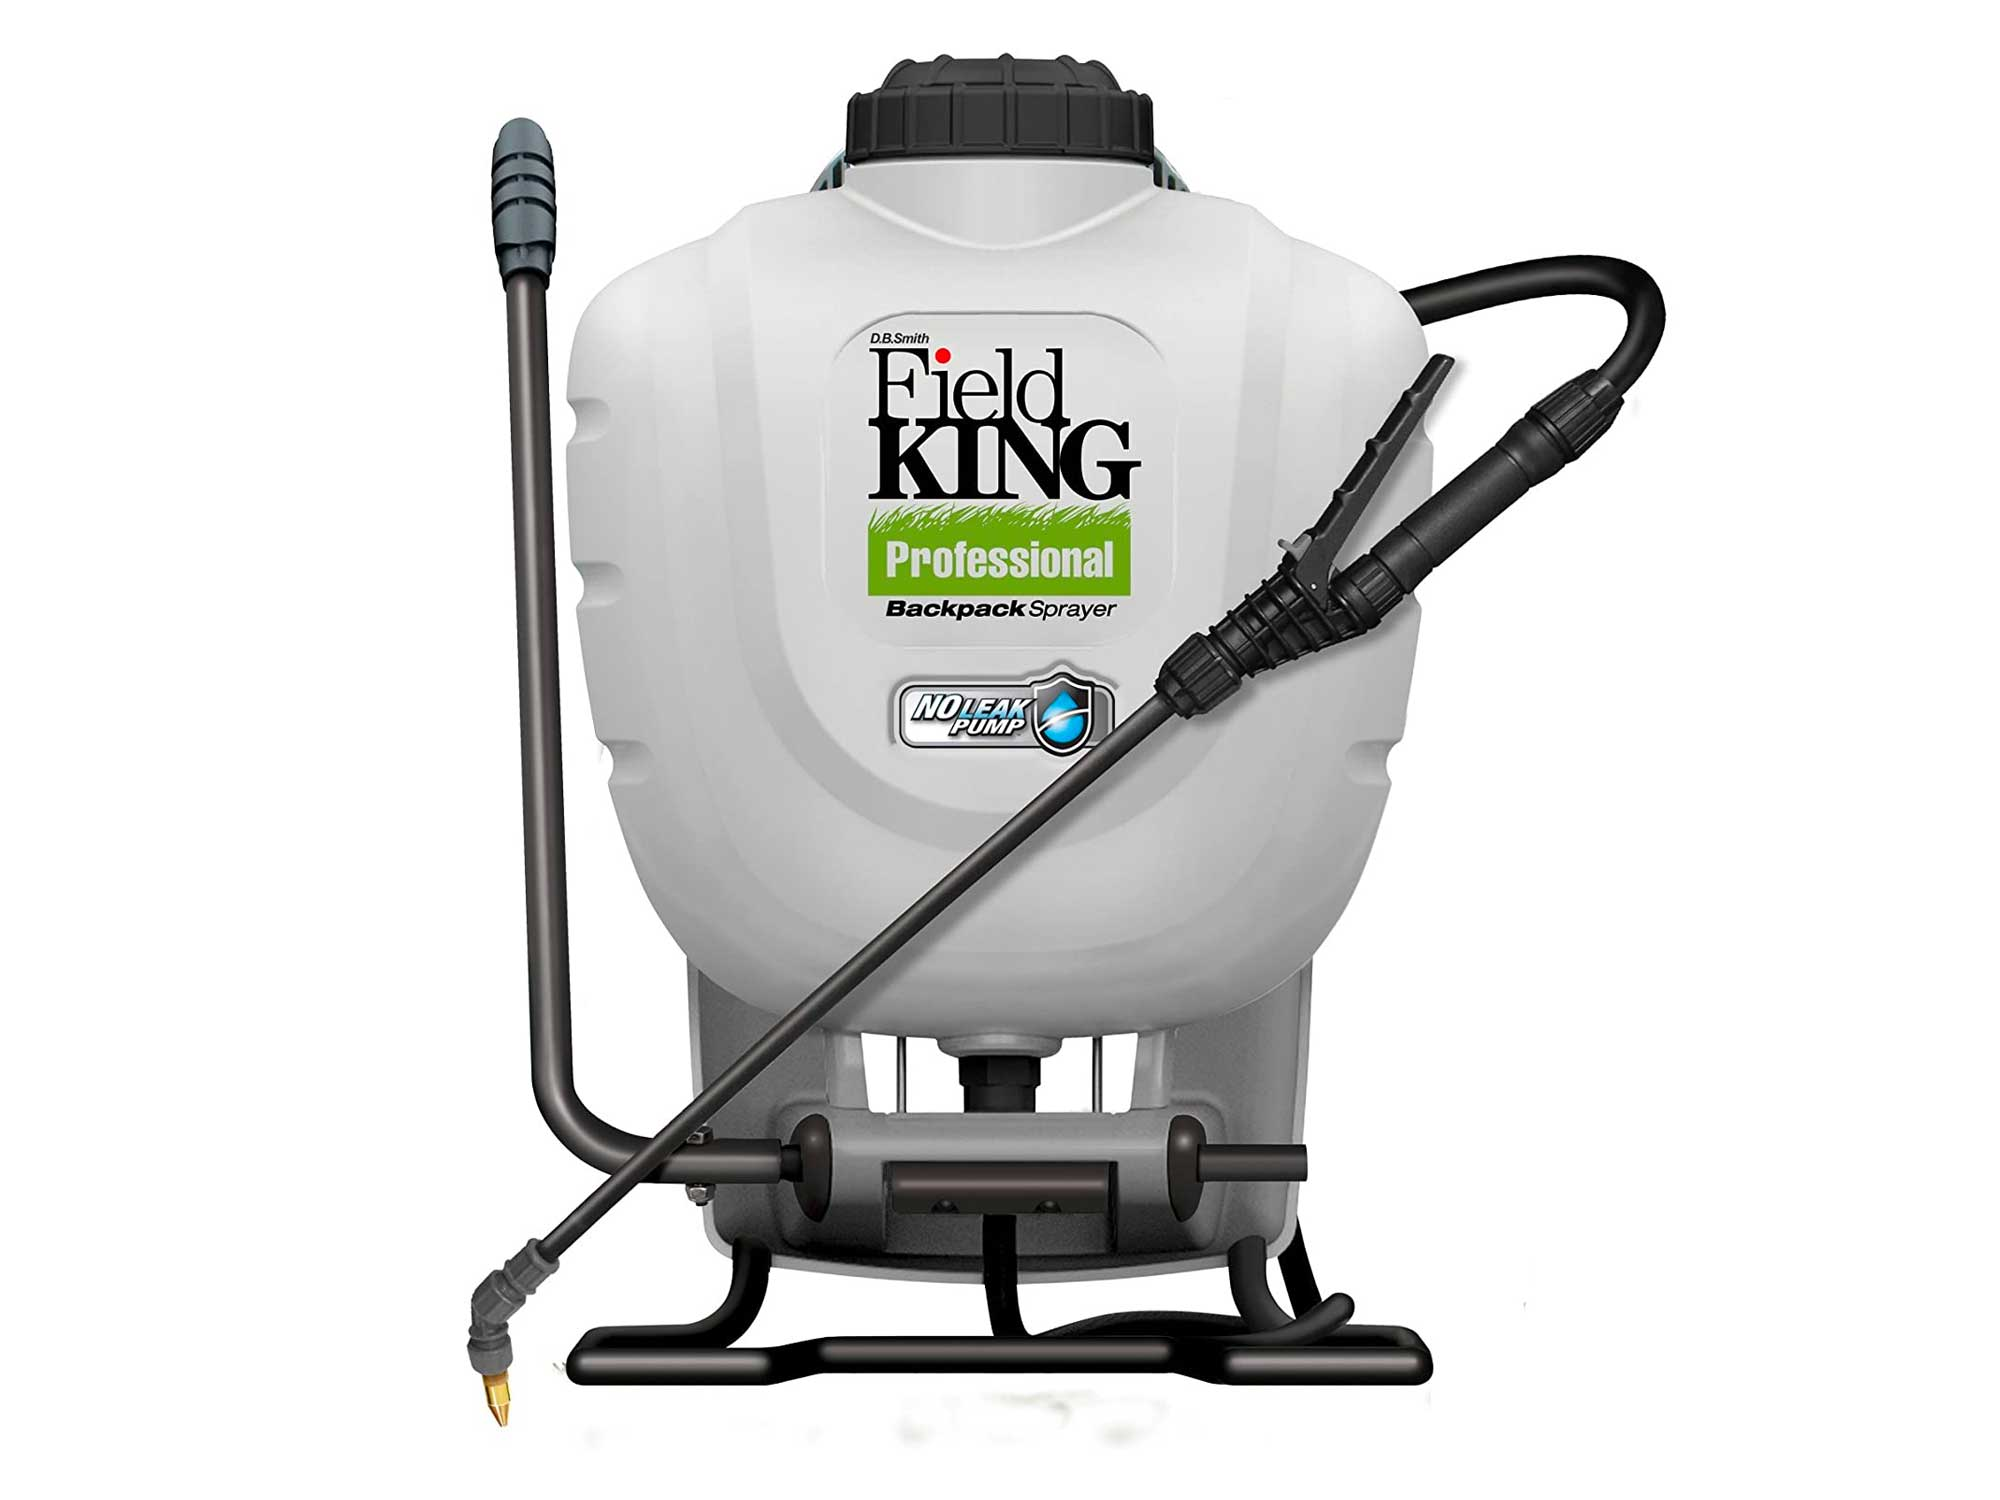 Field King 190328 Backpack Sprayer, 4 Gallon